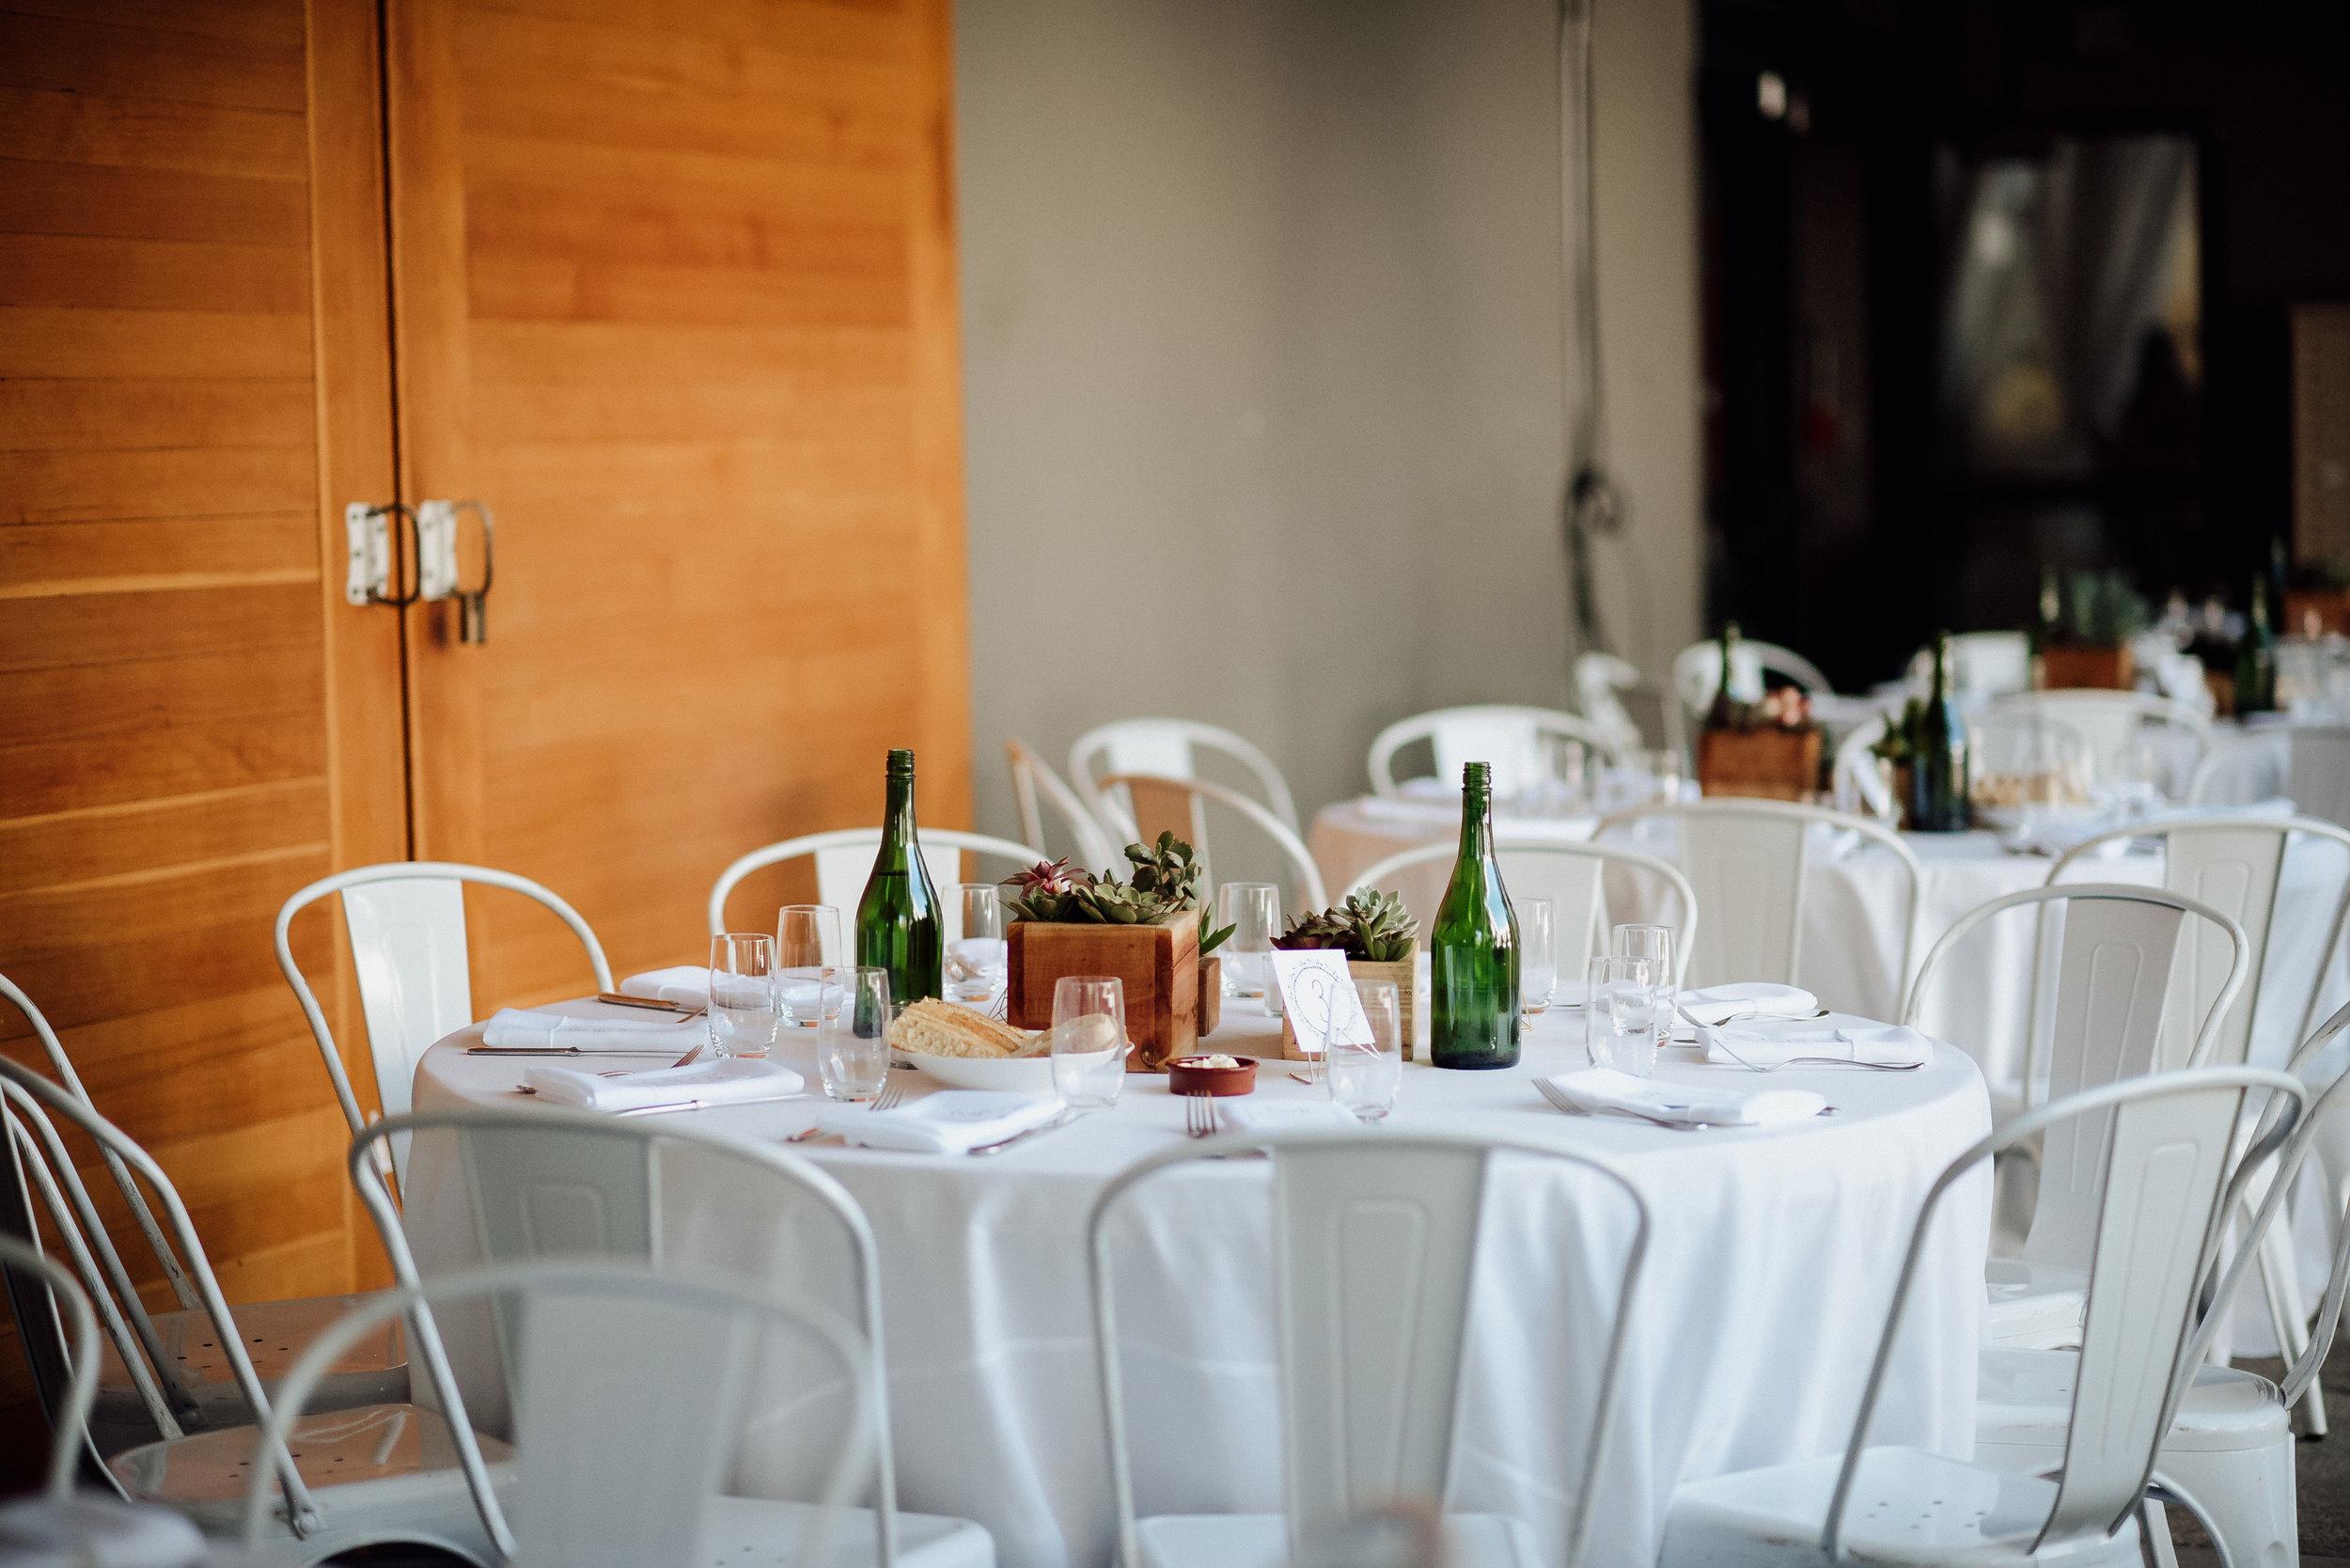 aracely-cafe-wedding-treasure-island-marble-rye-photography-062318-details-083.jpg